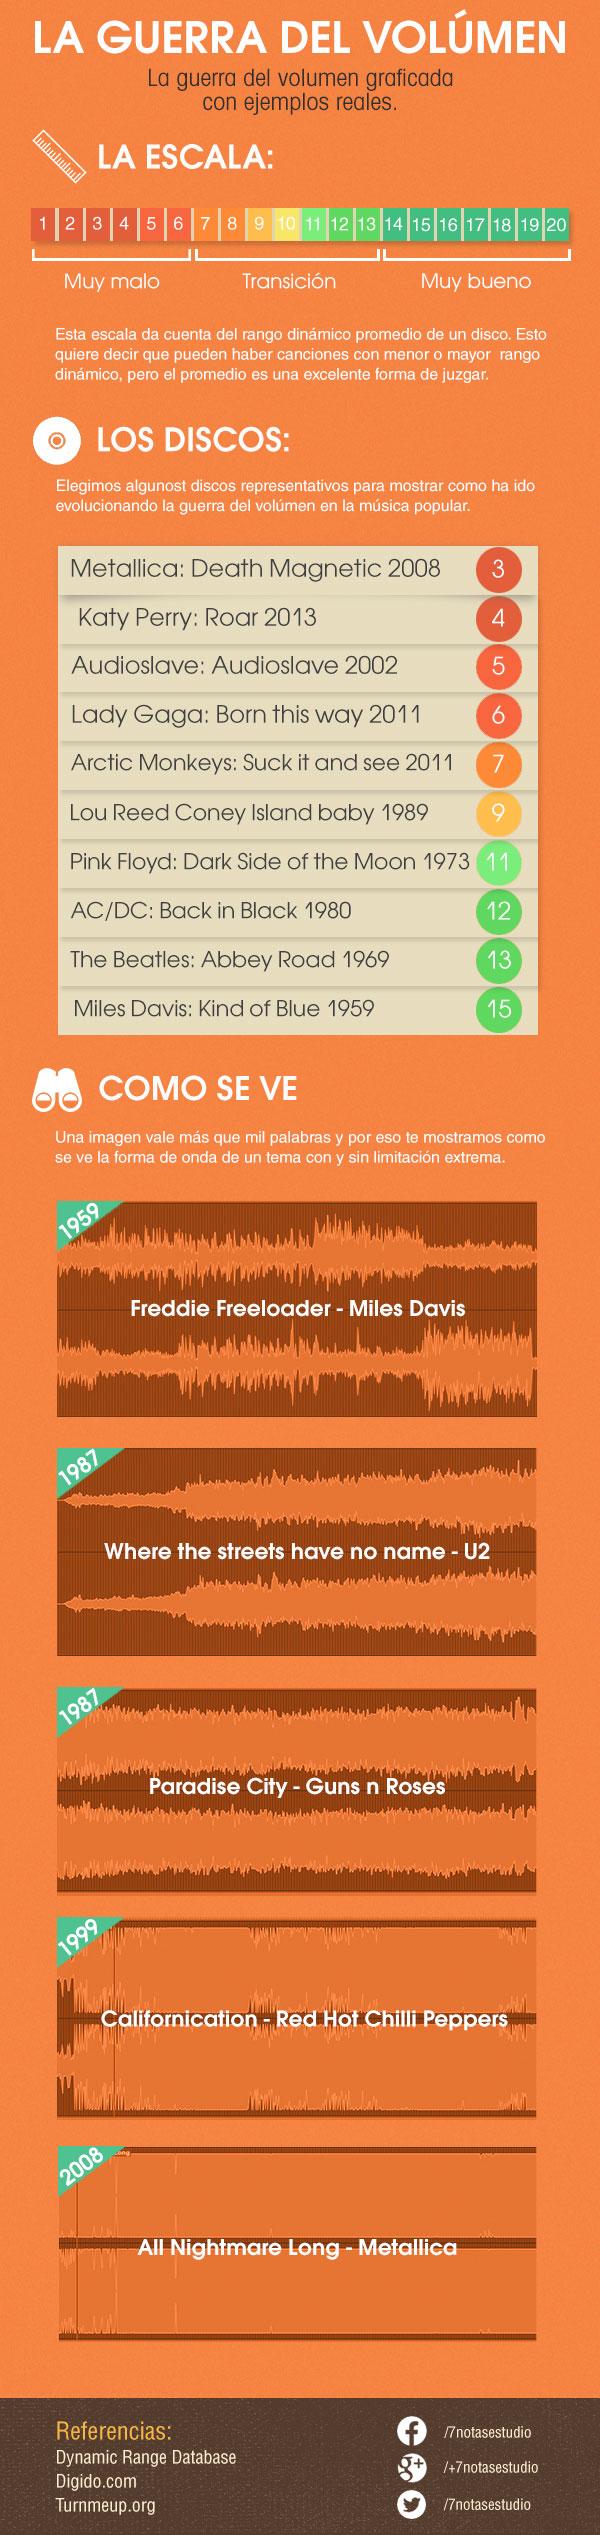 Comparativa Guerra del volumen